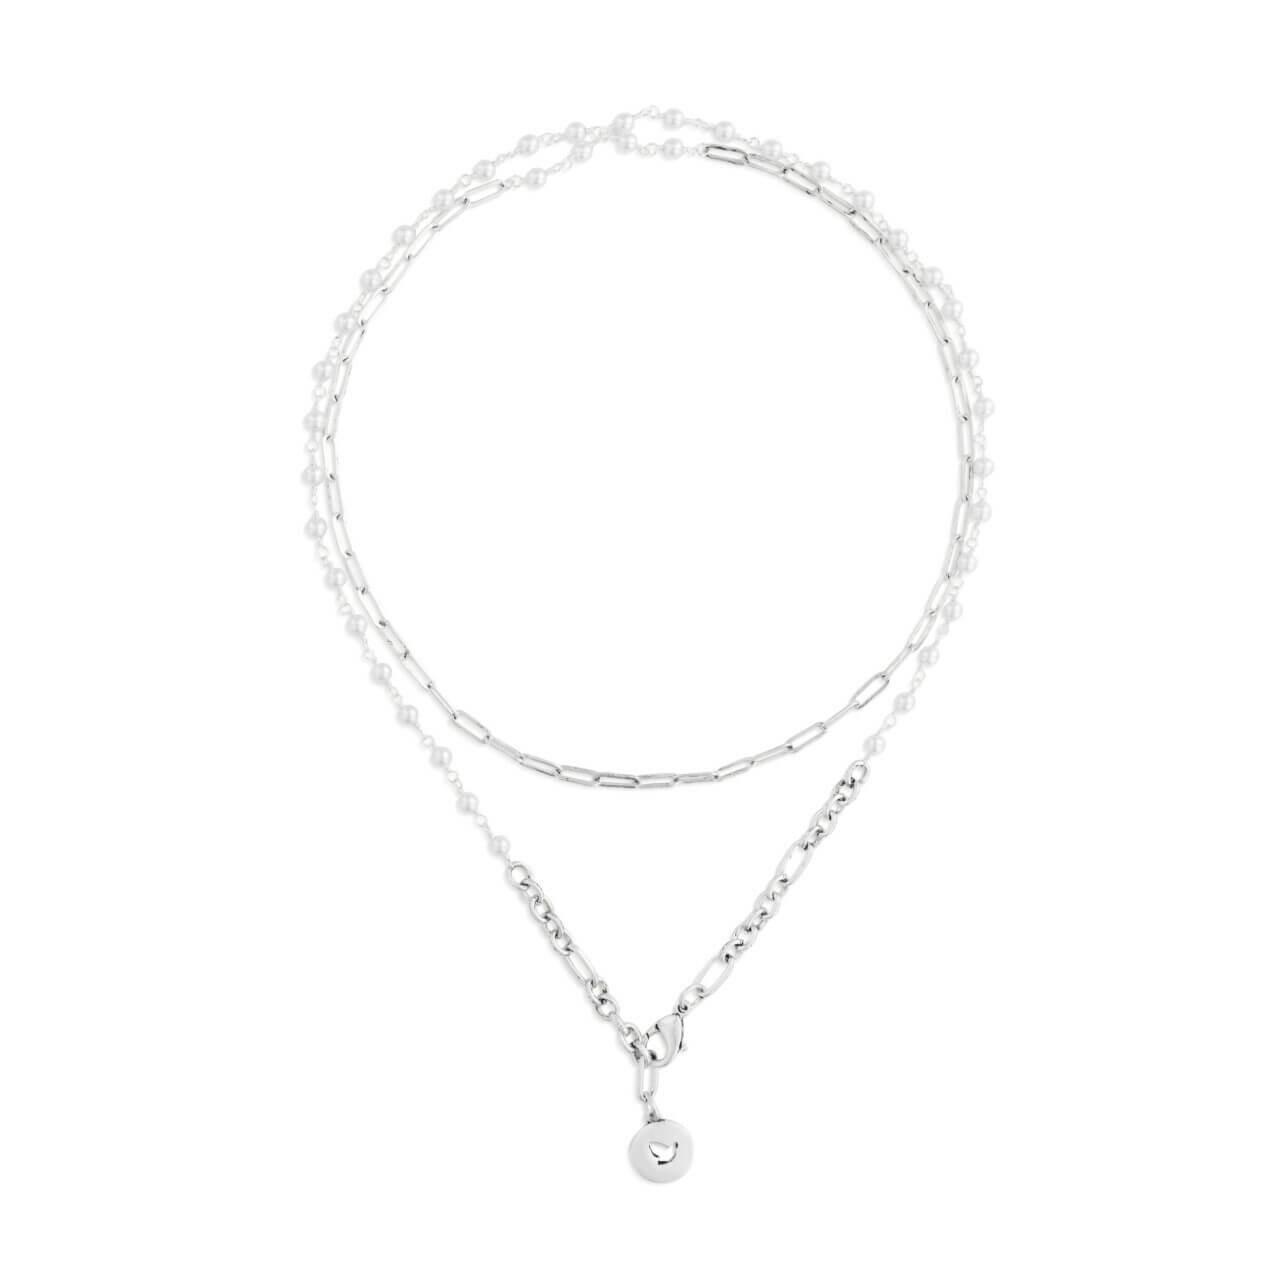 Wrapped in prayer remembrance bracelet necklace